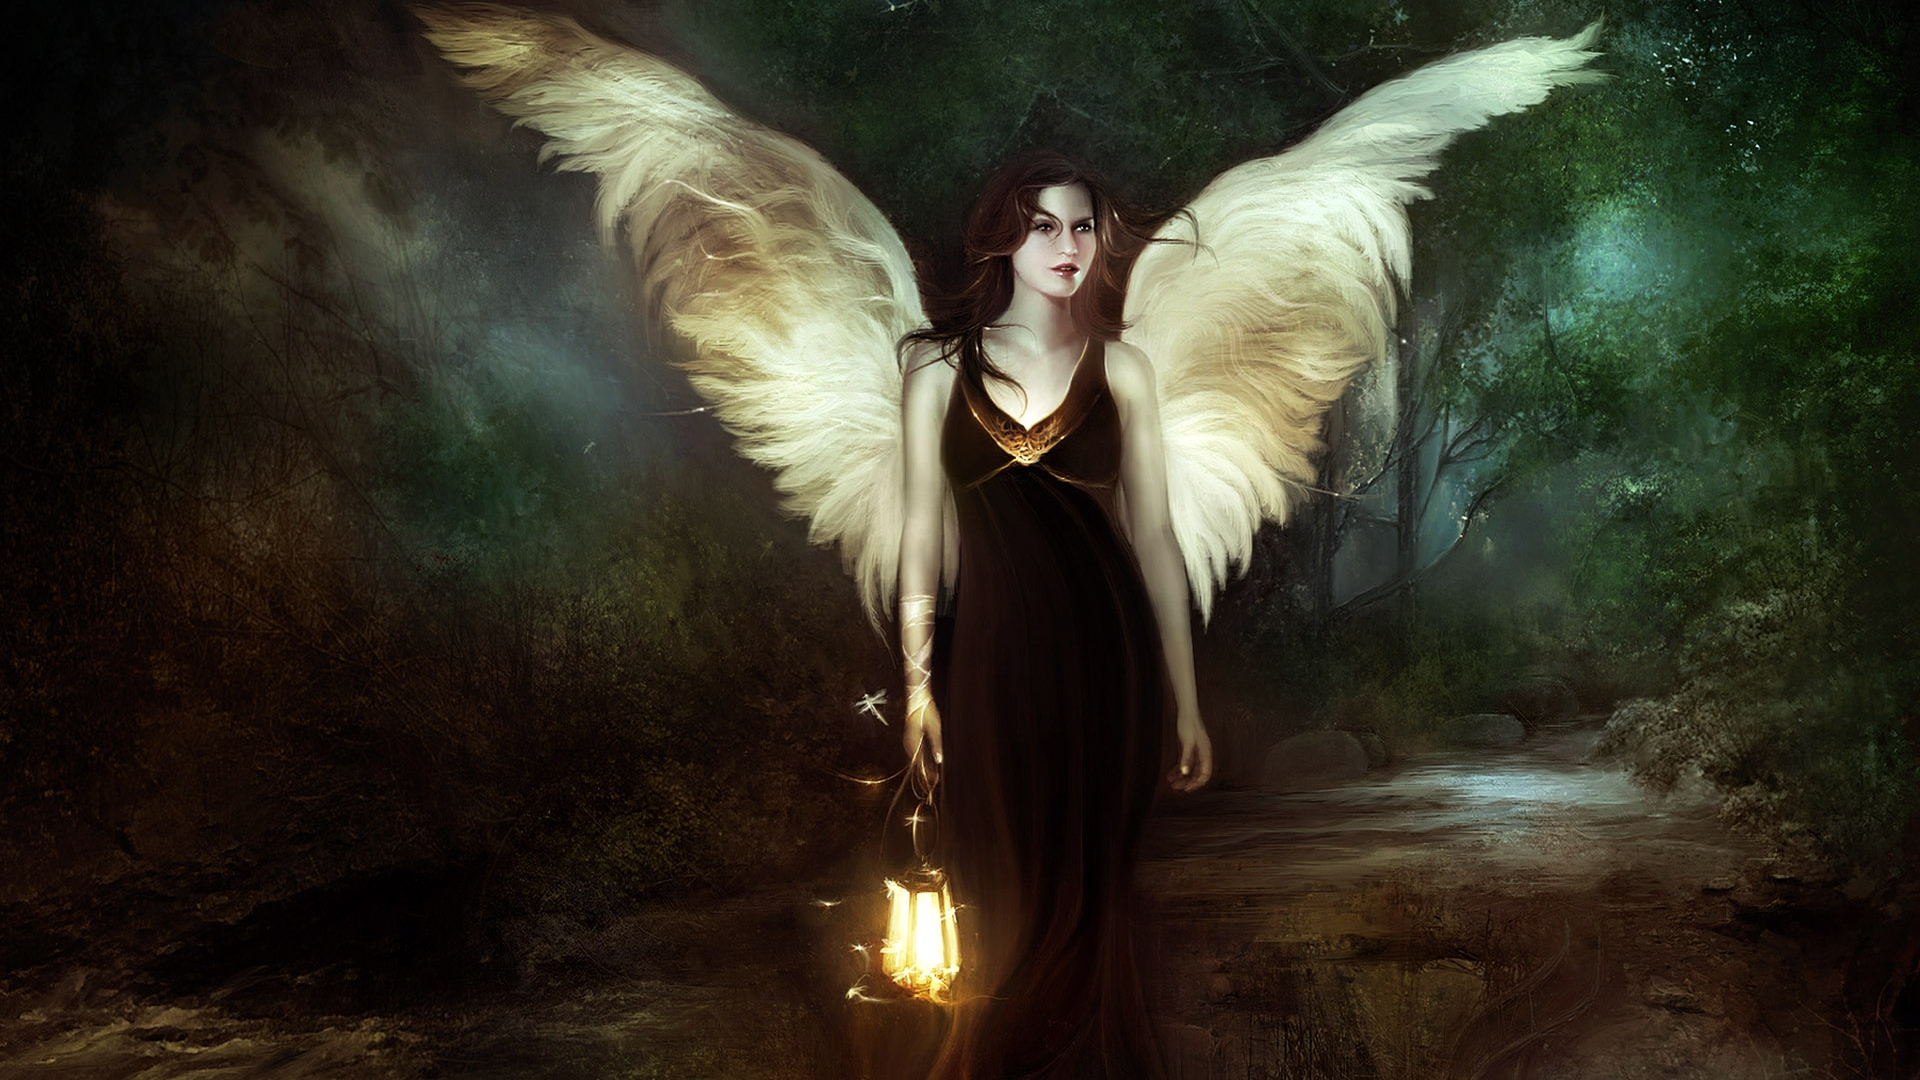 Fantasy Fairy Woman Forest Angel 1920x1080